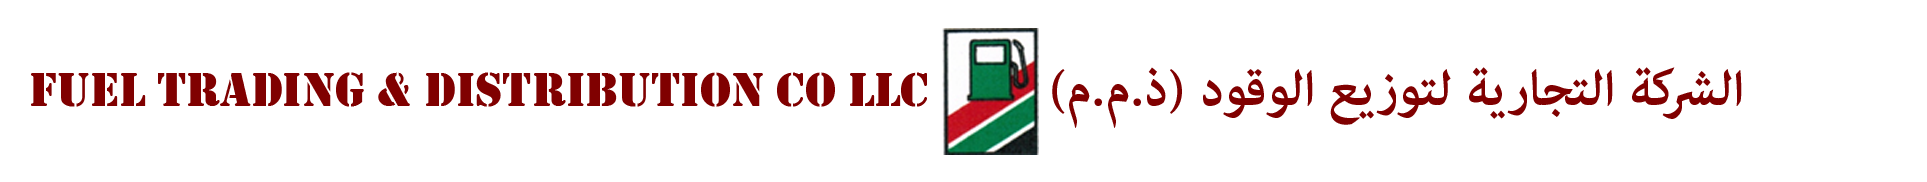 Fuel Oil Suppliers In Uae   Dubai Fuel Supply   Fuel Trading